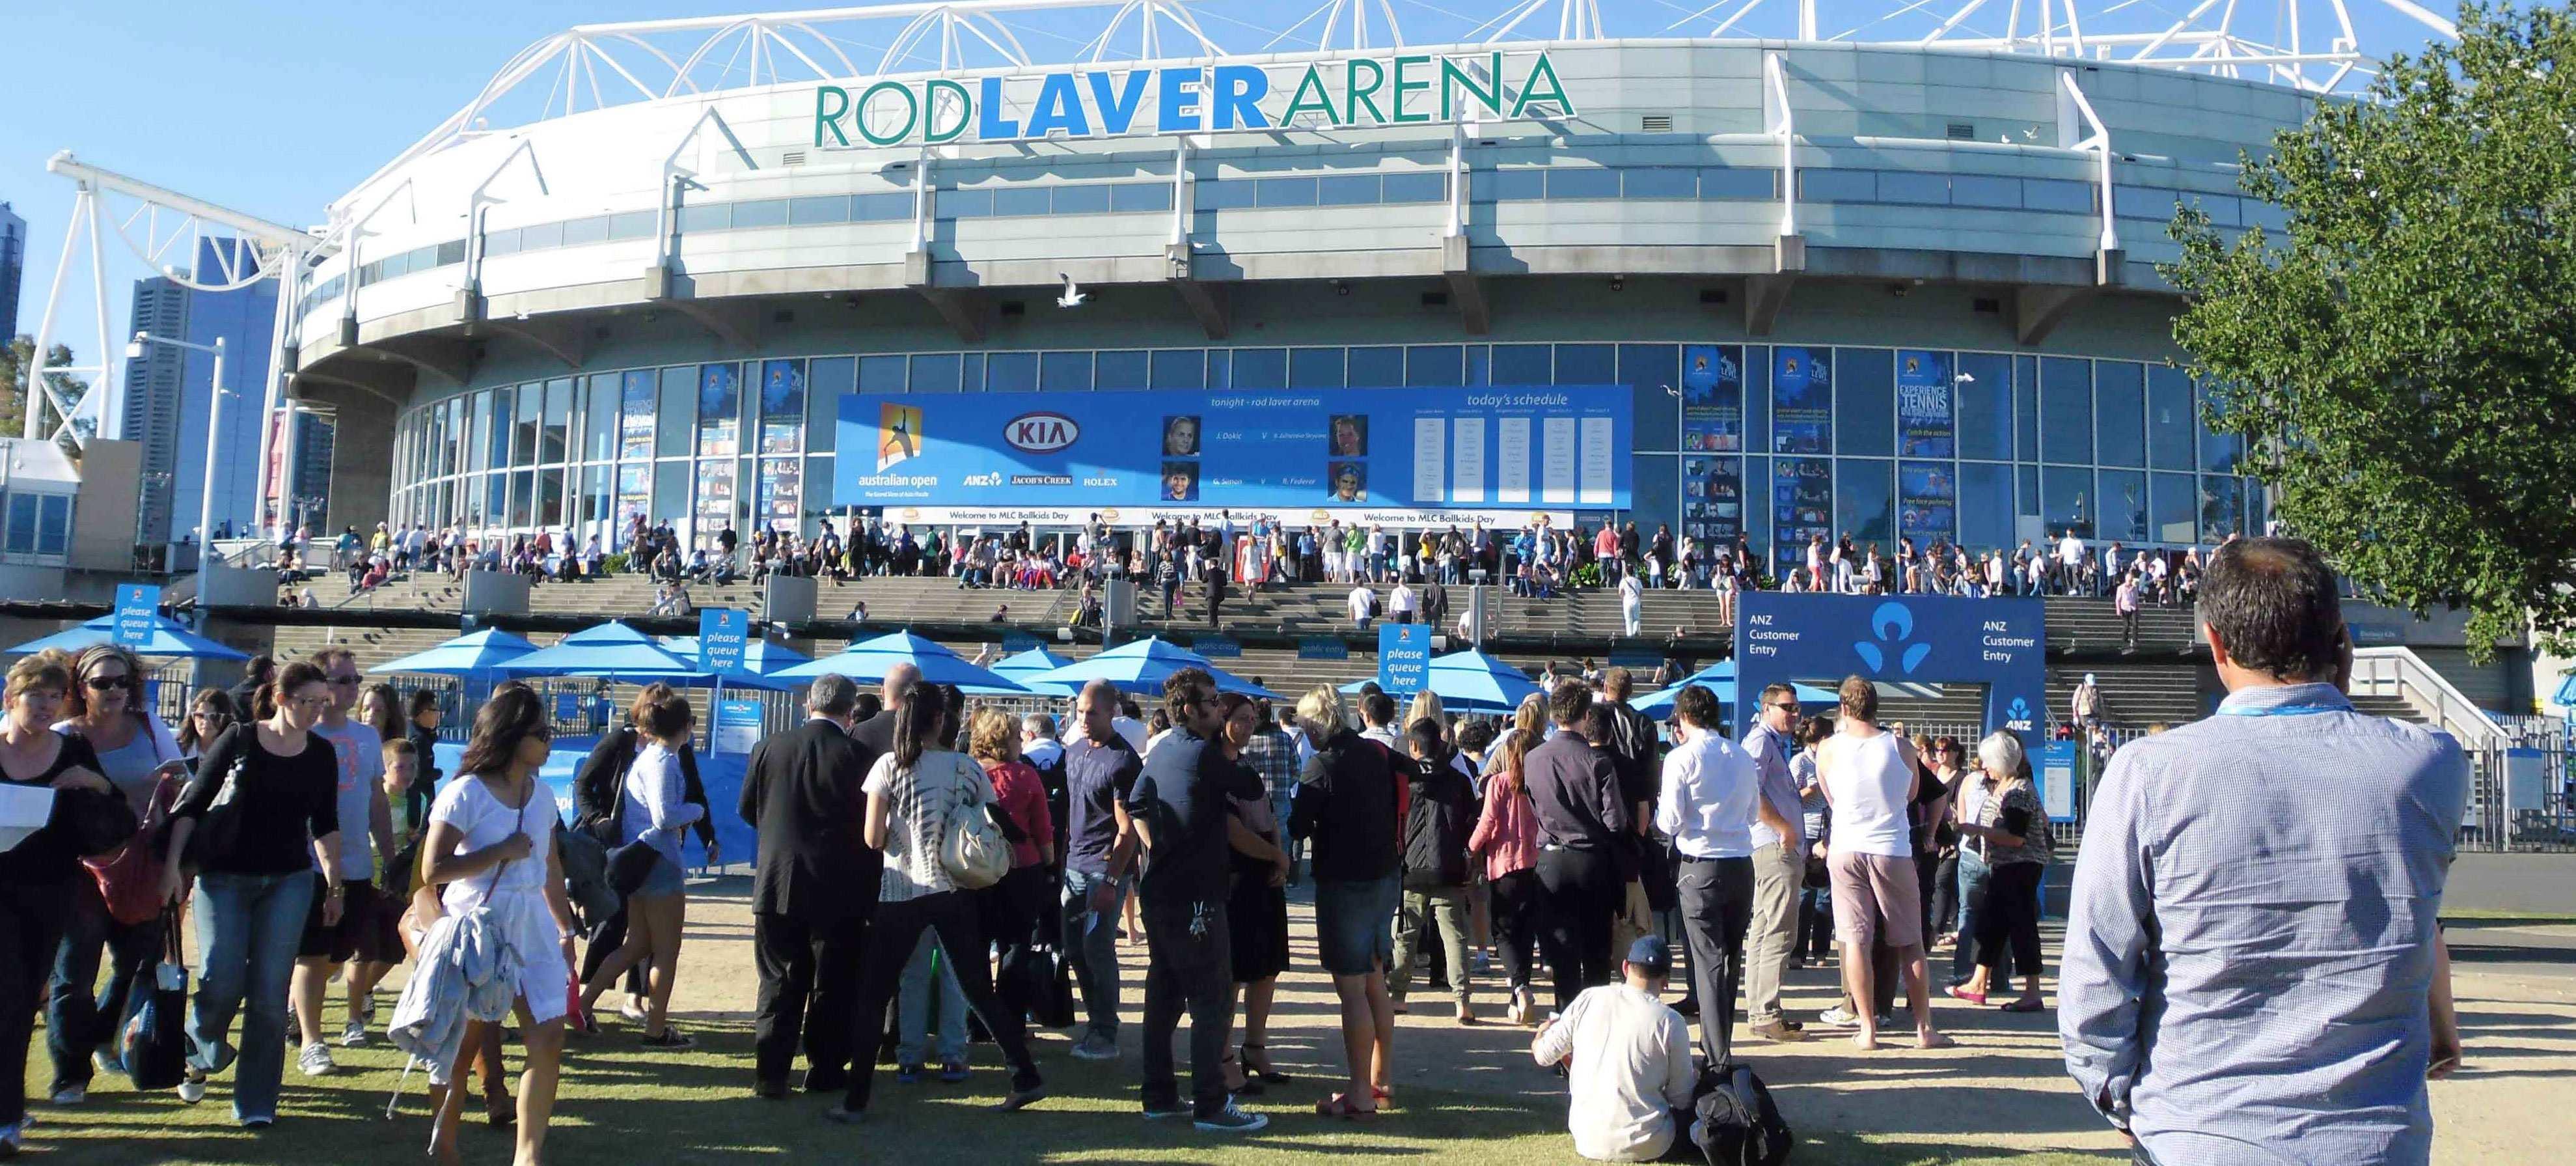 66 Great Volvo Tennis Open 2020 Speed Test with Volvo Tennis Open 2020